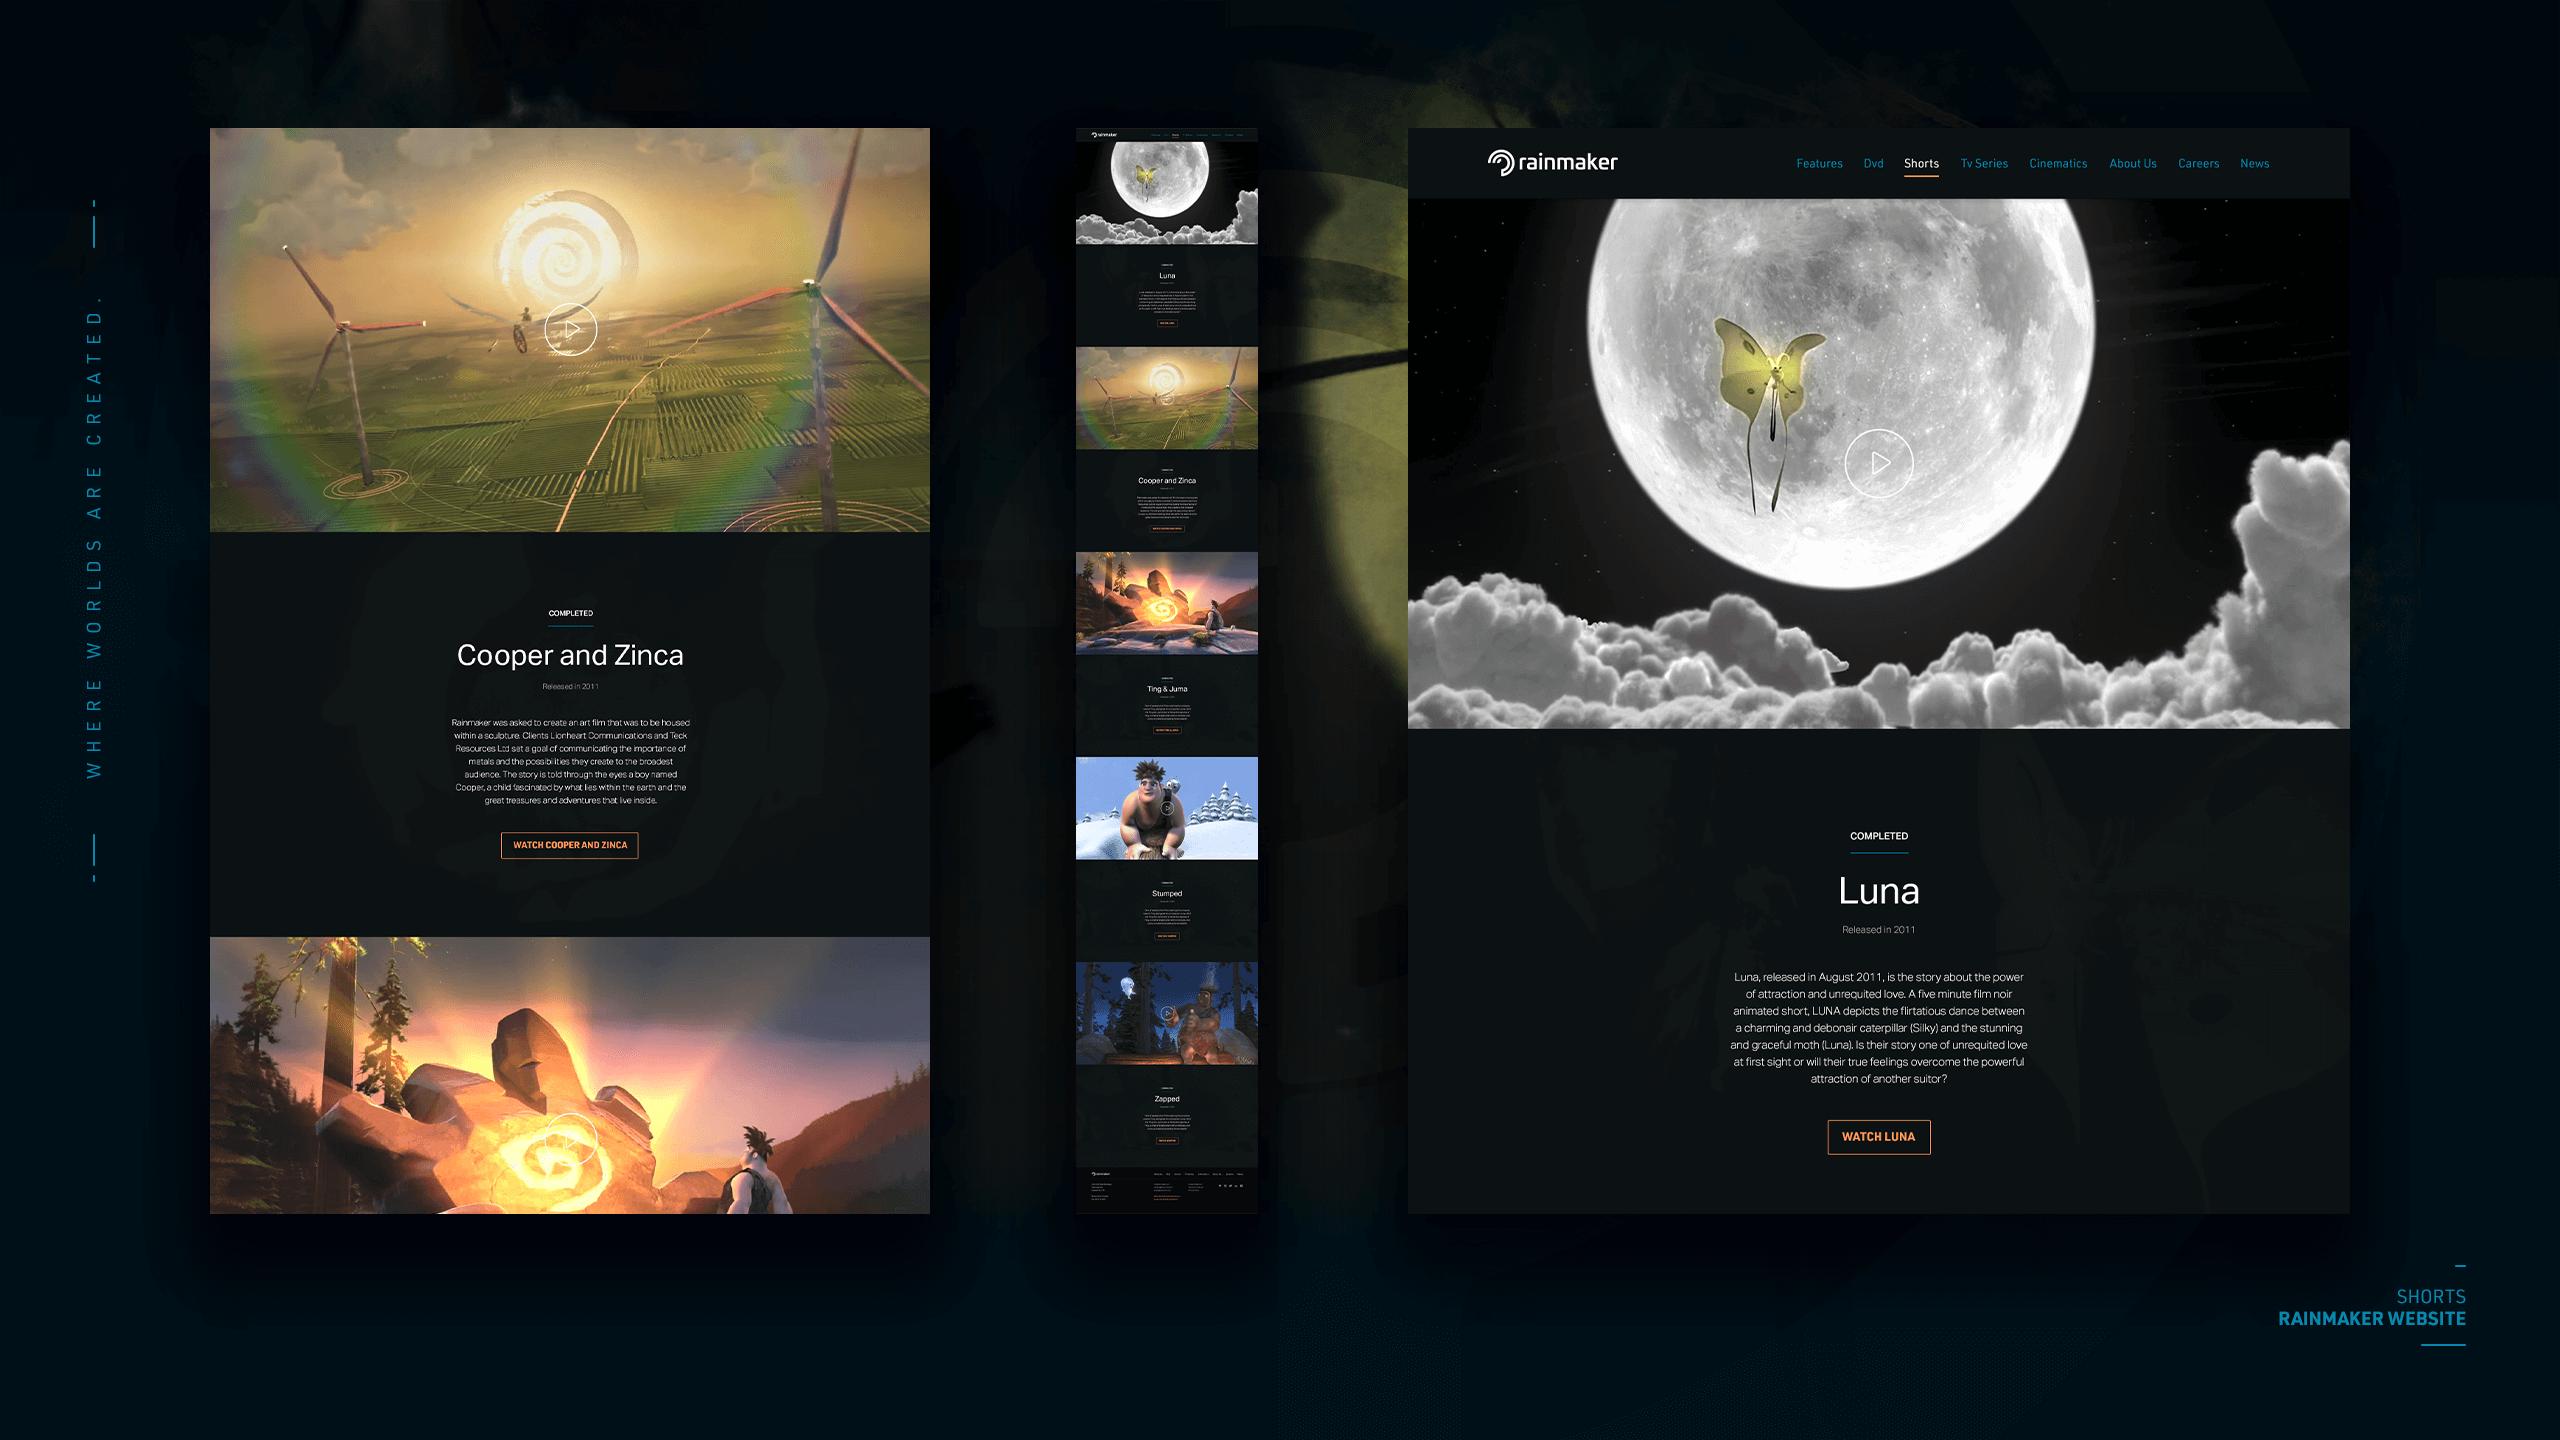 rainmaker-website-desktop-shorts